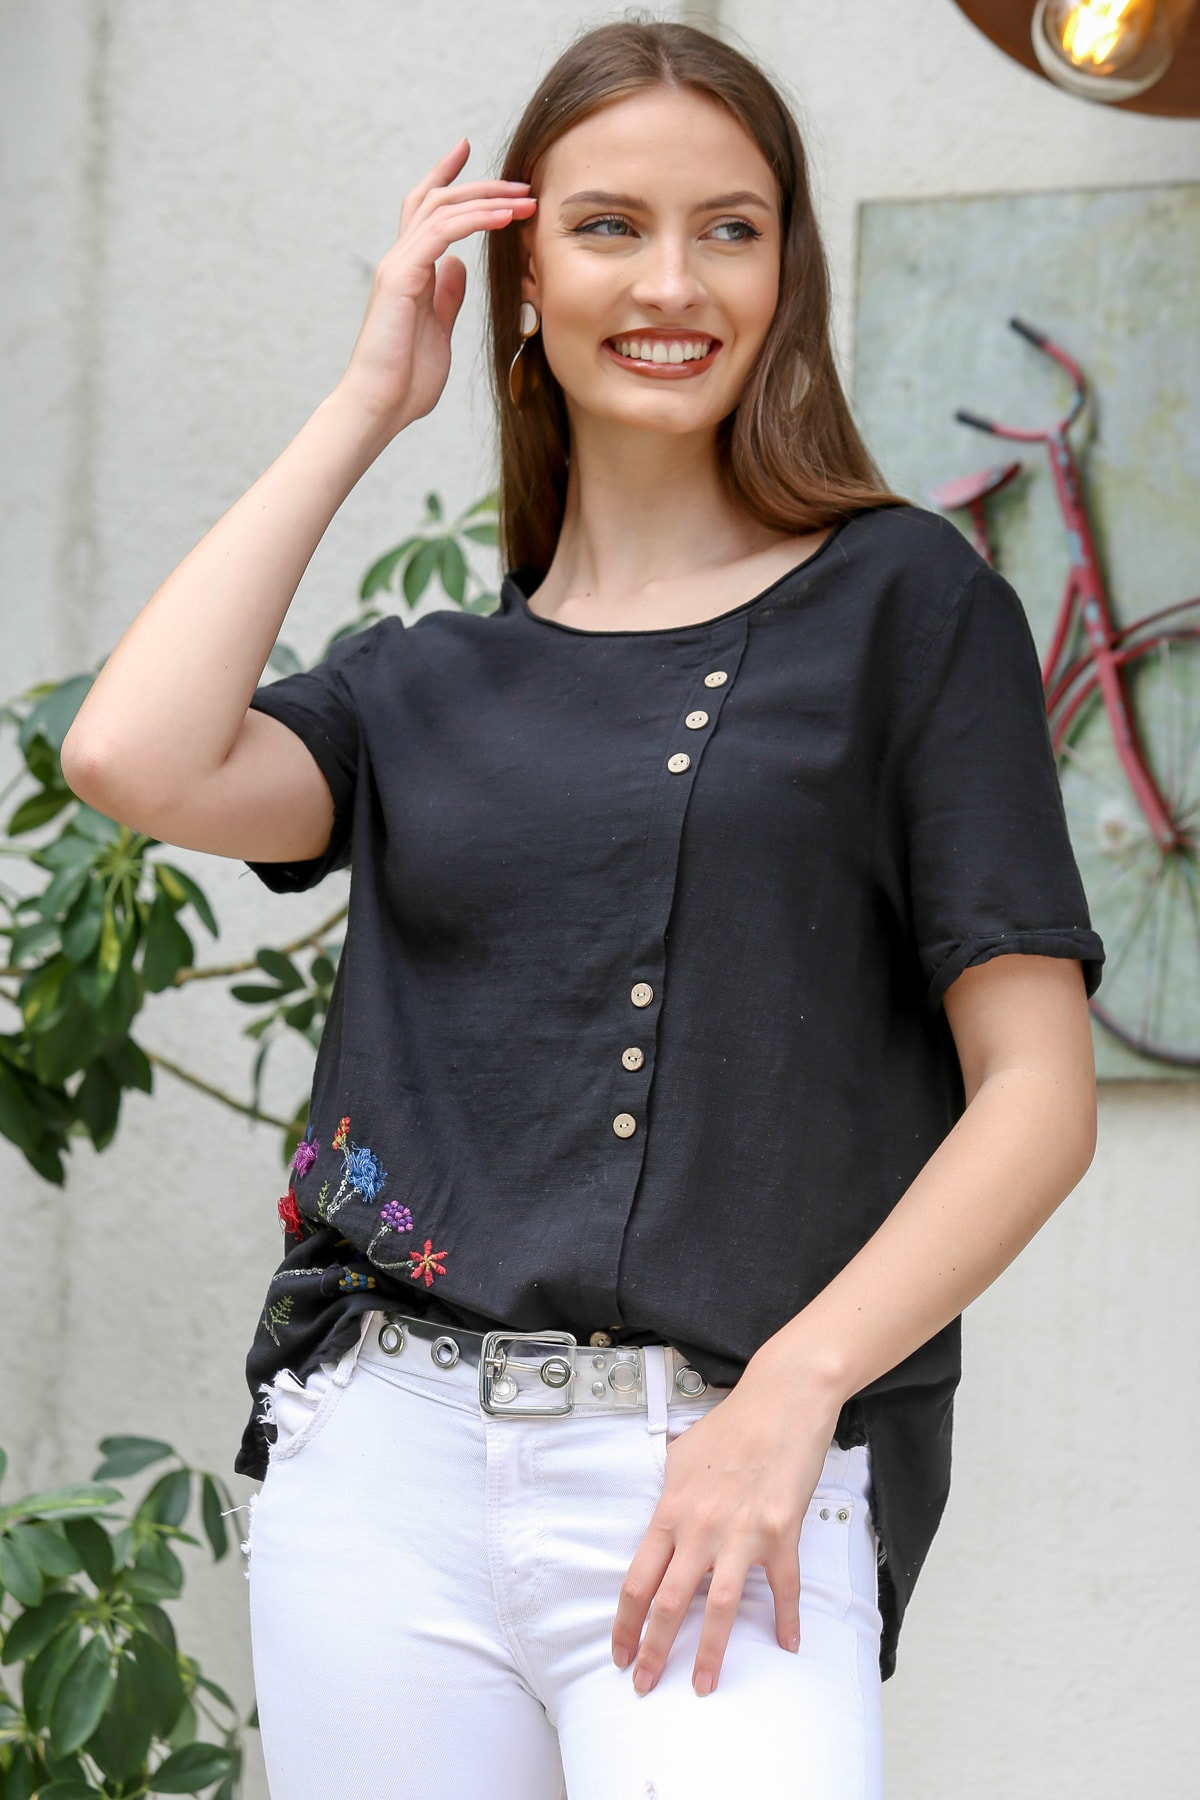 Chiccy Kadın Siyah Çiçek Buketi 3D Nakışlı Düğme Detaylı Salaş Dokuma Bluz M10010200BL95280 2